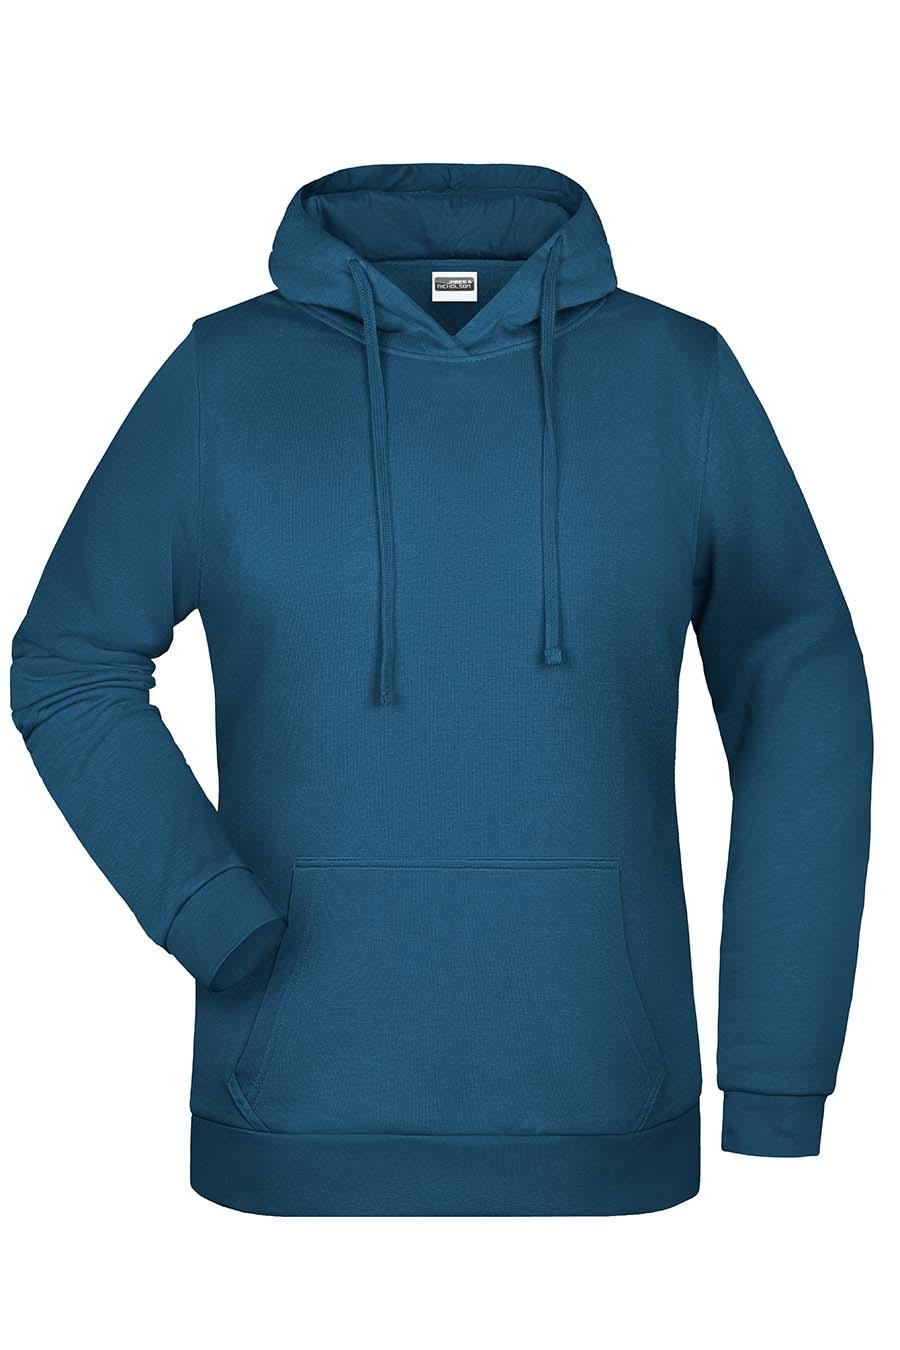 Sweat-shirt capuche femme - 20-1494-15